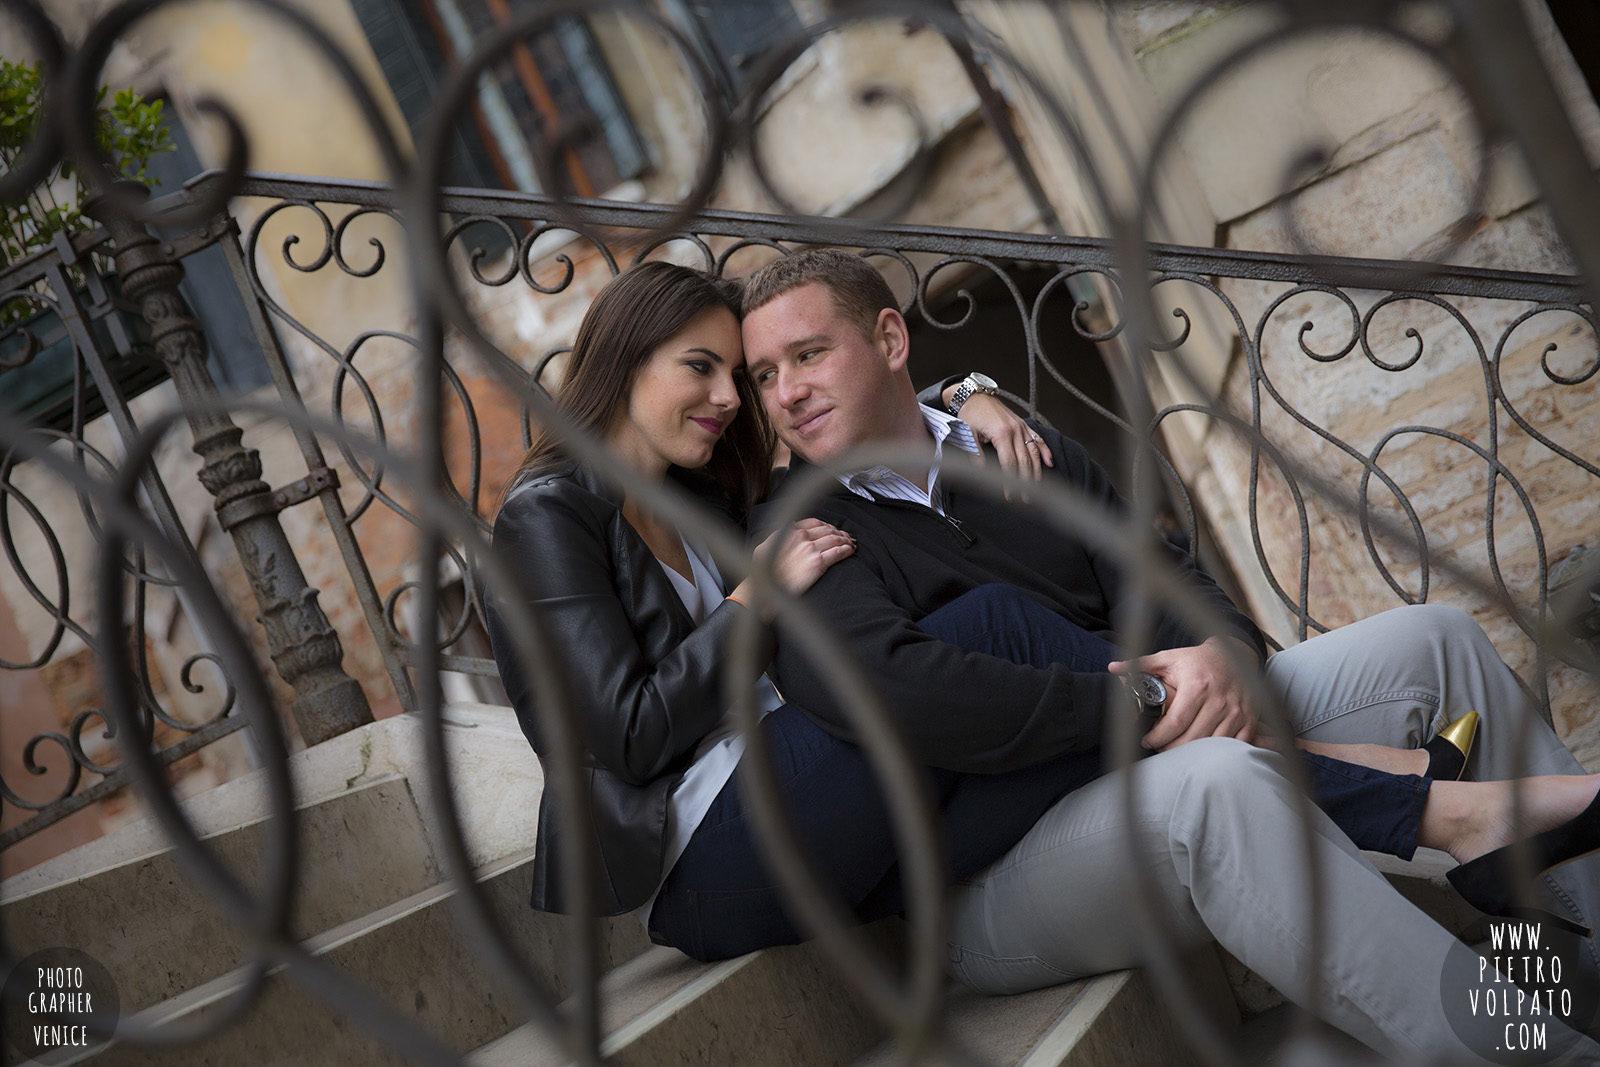 pre-wedding-love-story-photoshoot-in-venice-italy-photographer-pietro-volpato-20161229_05